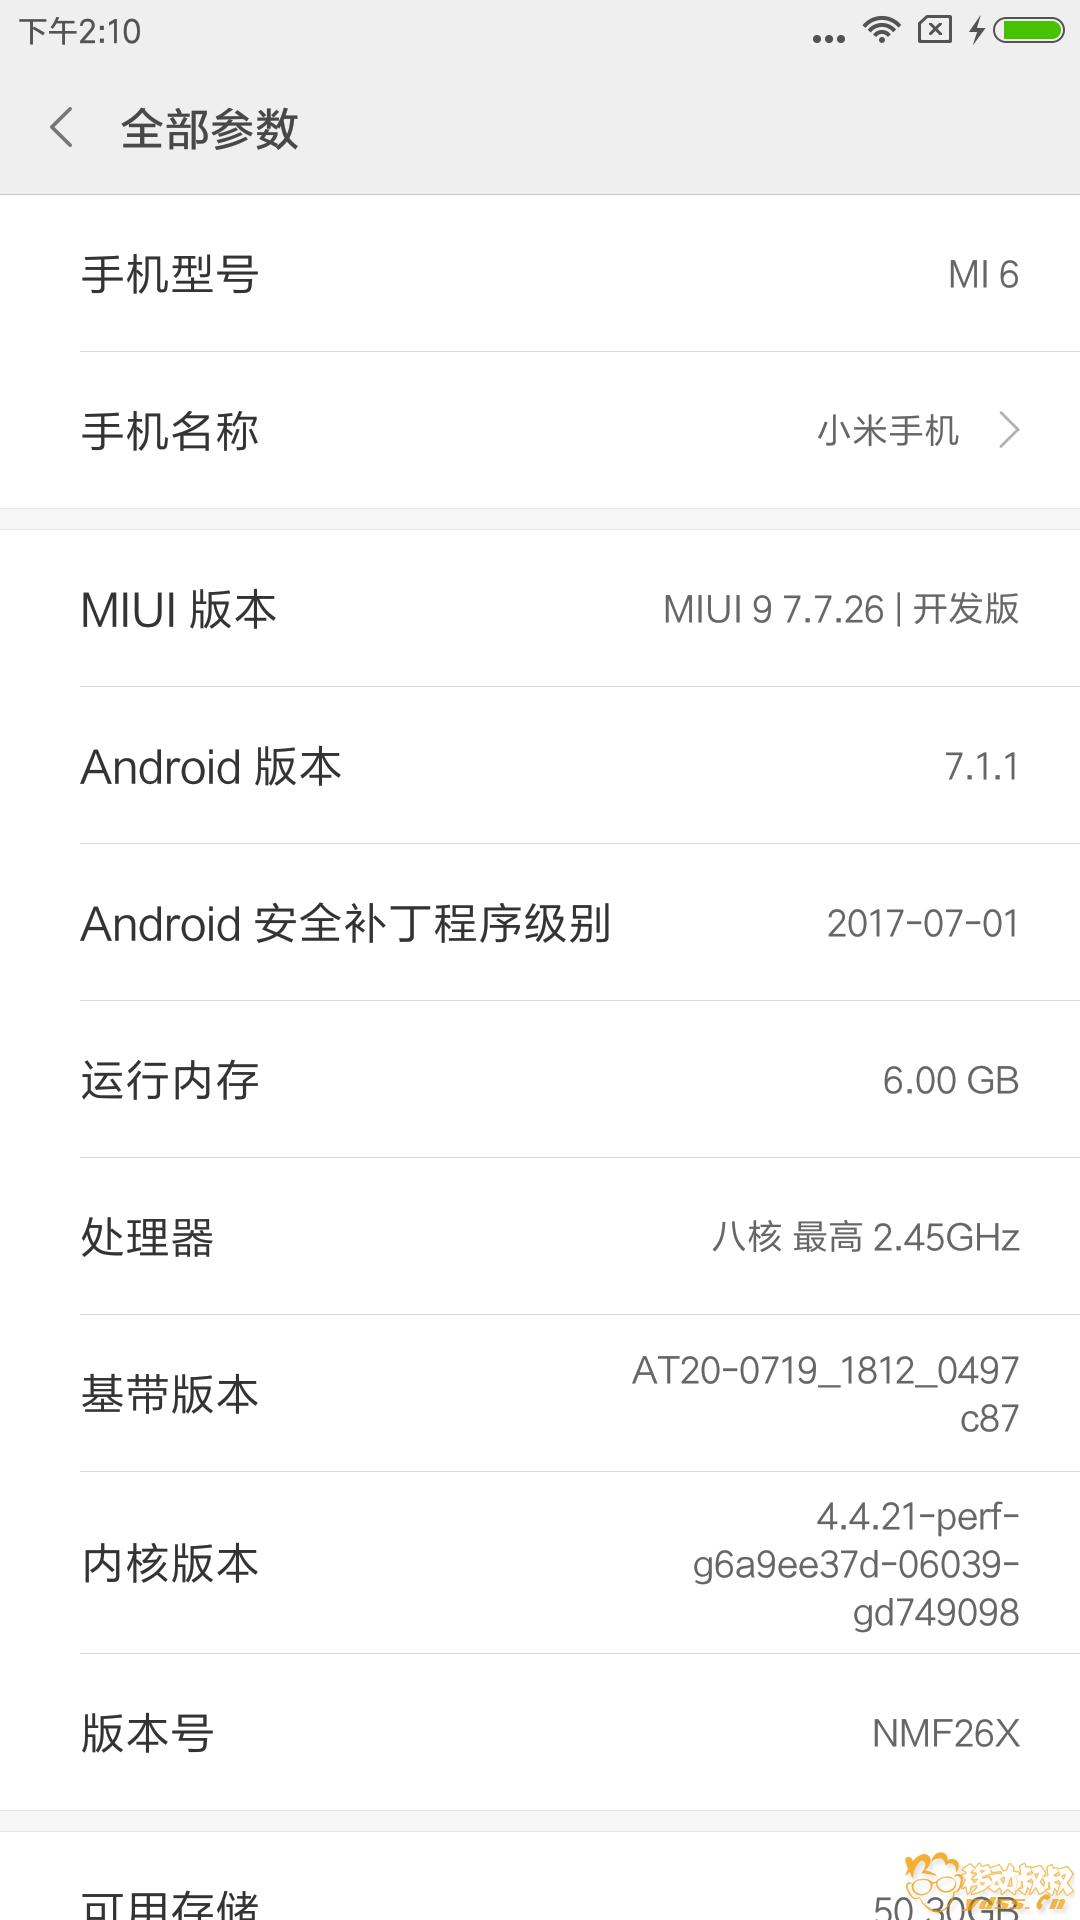 Screenshot_2017-07-27-14-10-38-145_com.android.settings.png